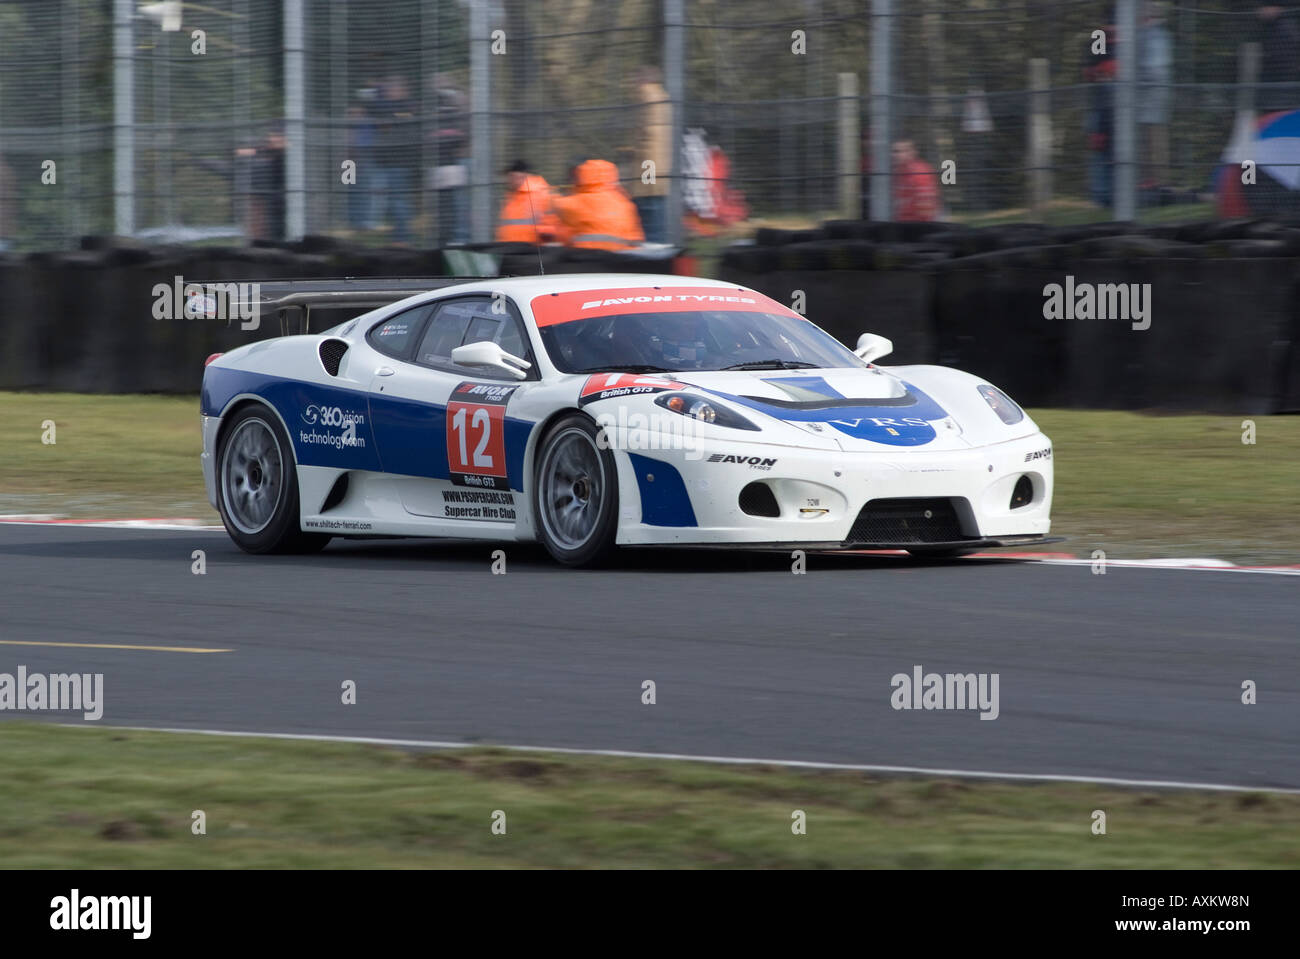 Ferrari 430 GT3 Sports Racing Car in British GT Championship at ...